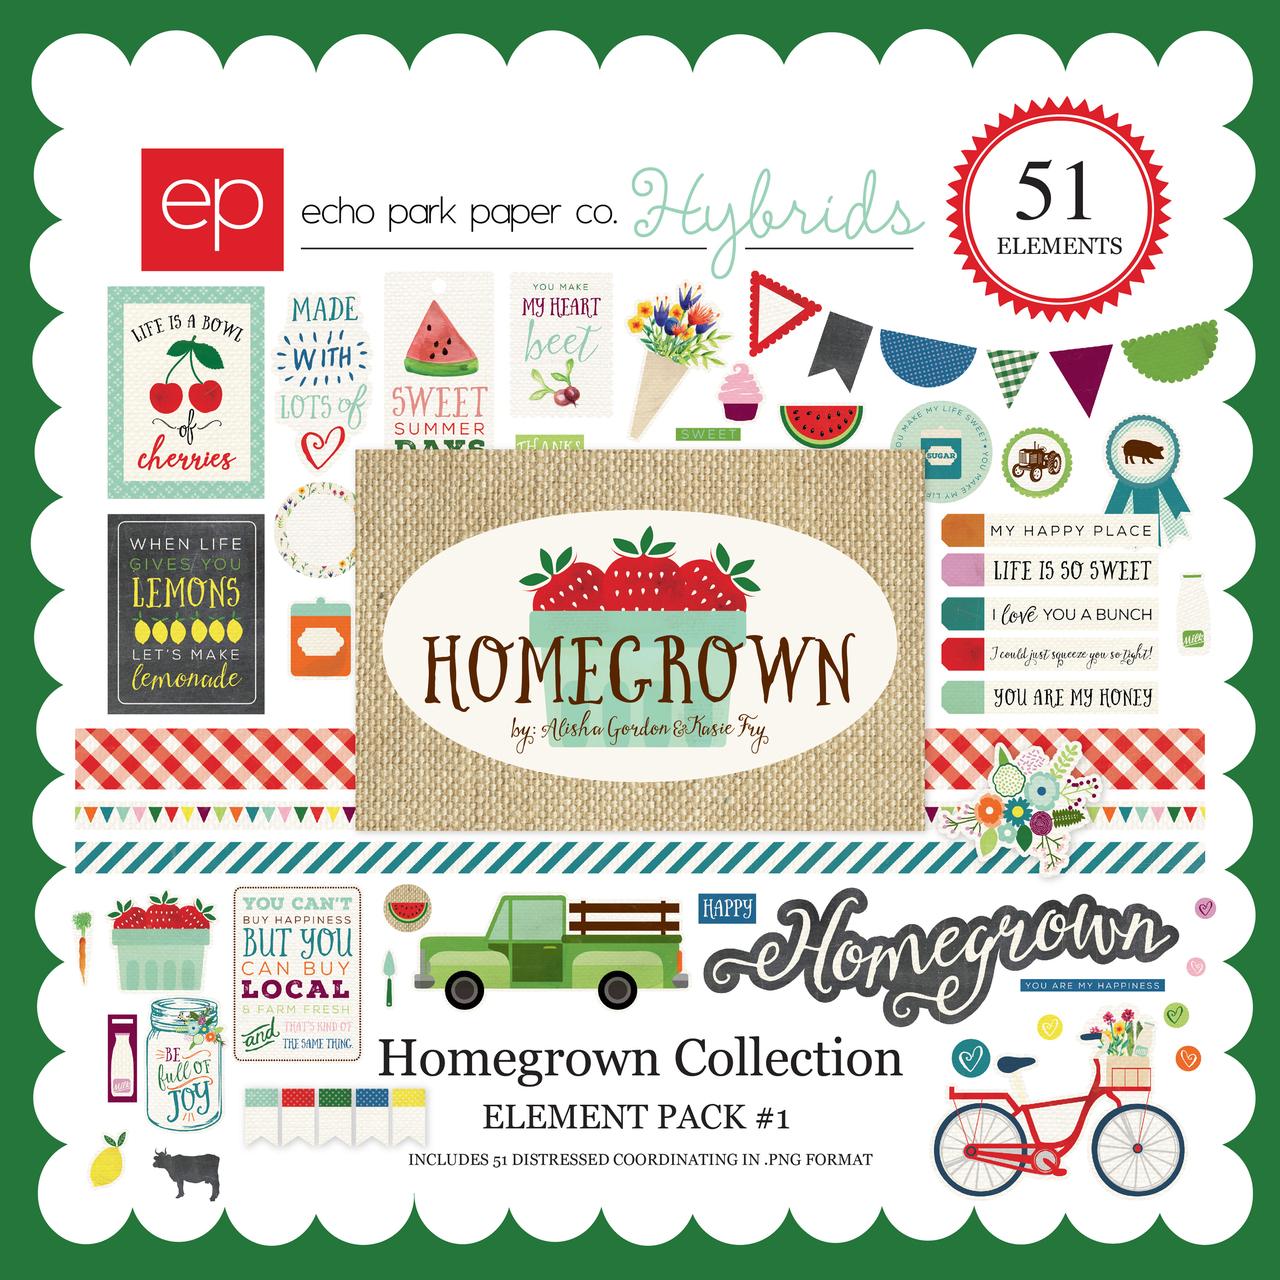 Homegrown Element Pack #1